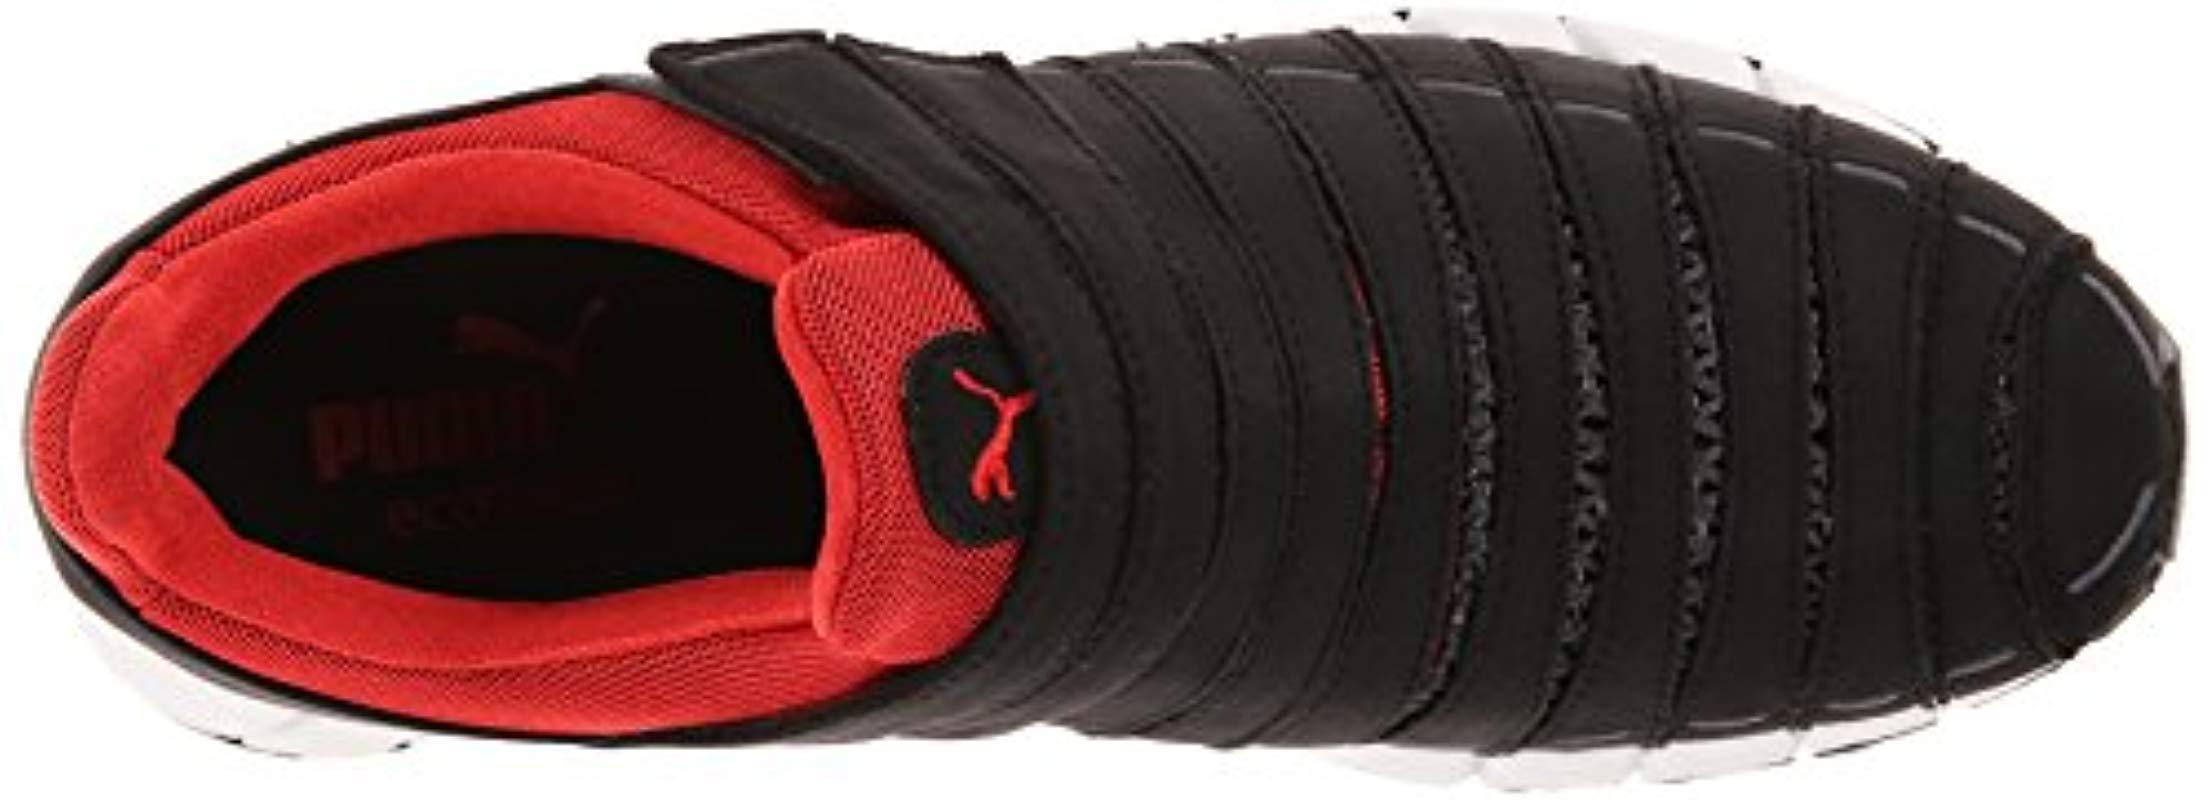 PUMA - Black Osu Nm Cross-training Shoe for Men - Lyst. View fullscreen 3086a1d95